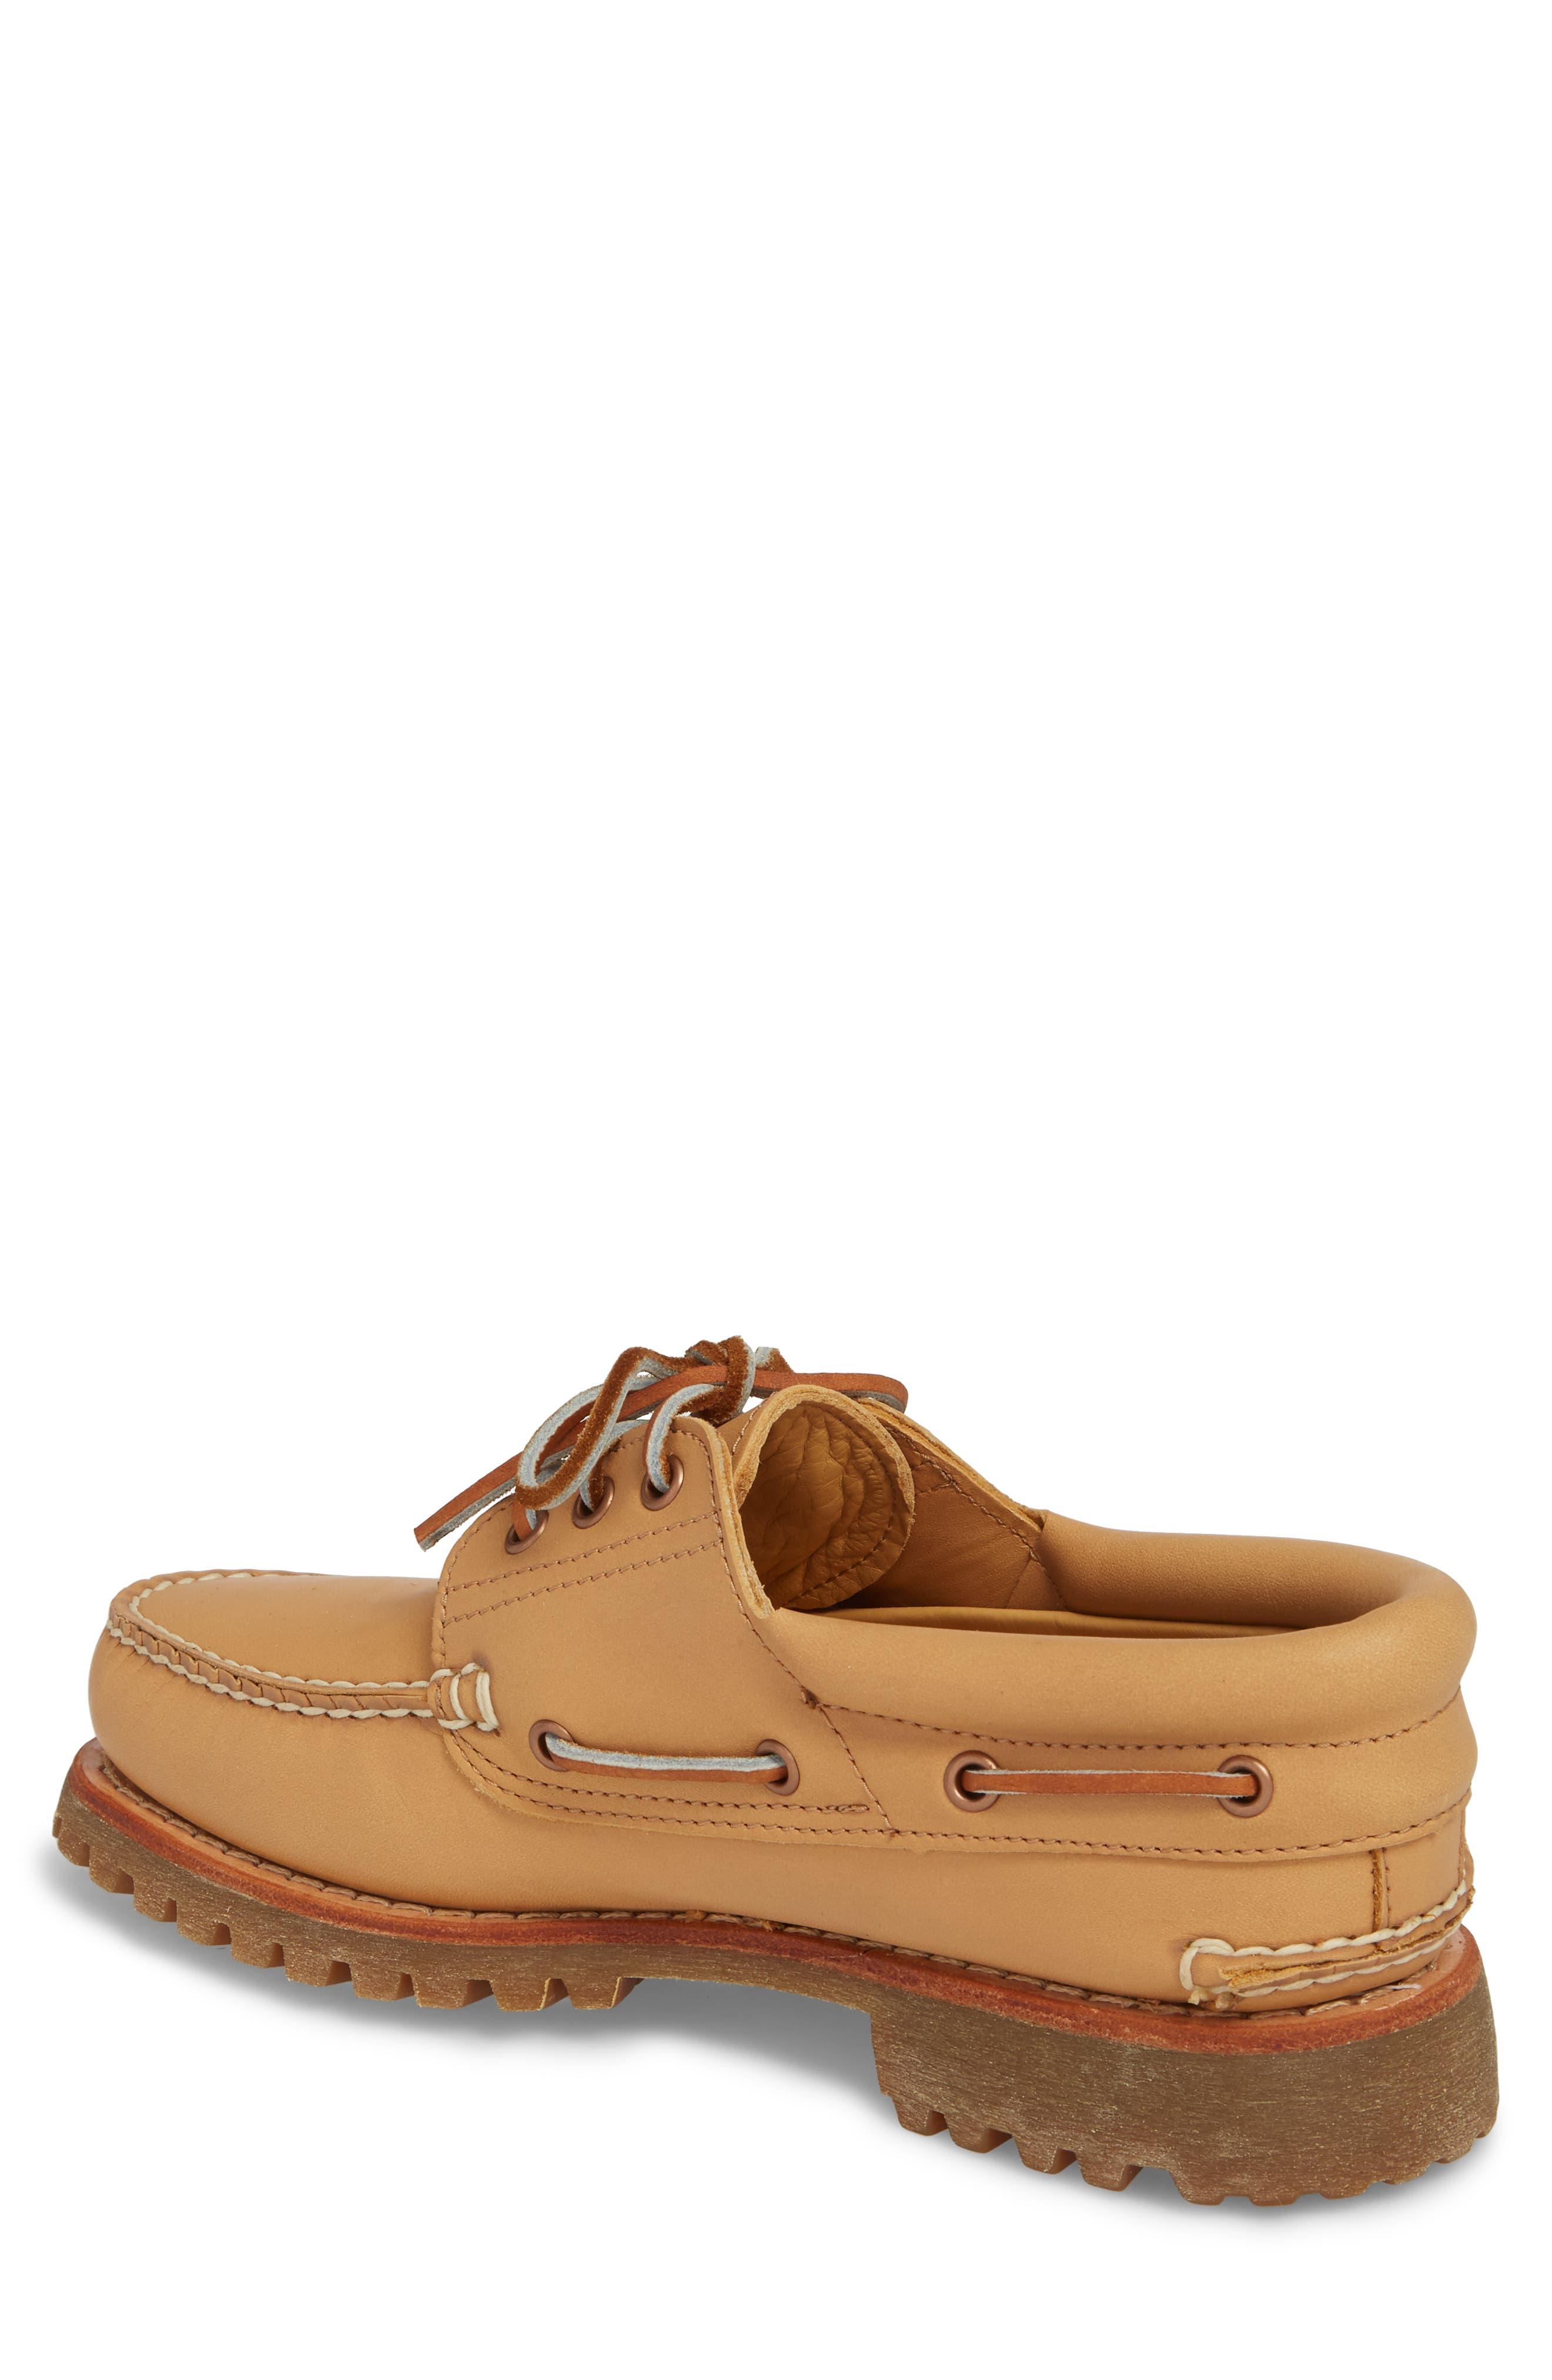 Lug Classic Boat Shoe,                             Alternate thumbnail 2, color,                             Natural Leahter